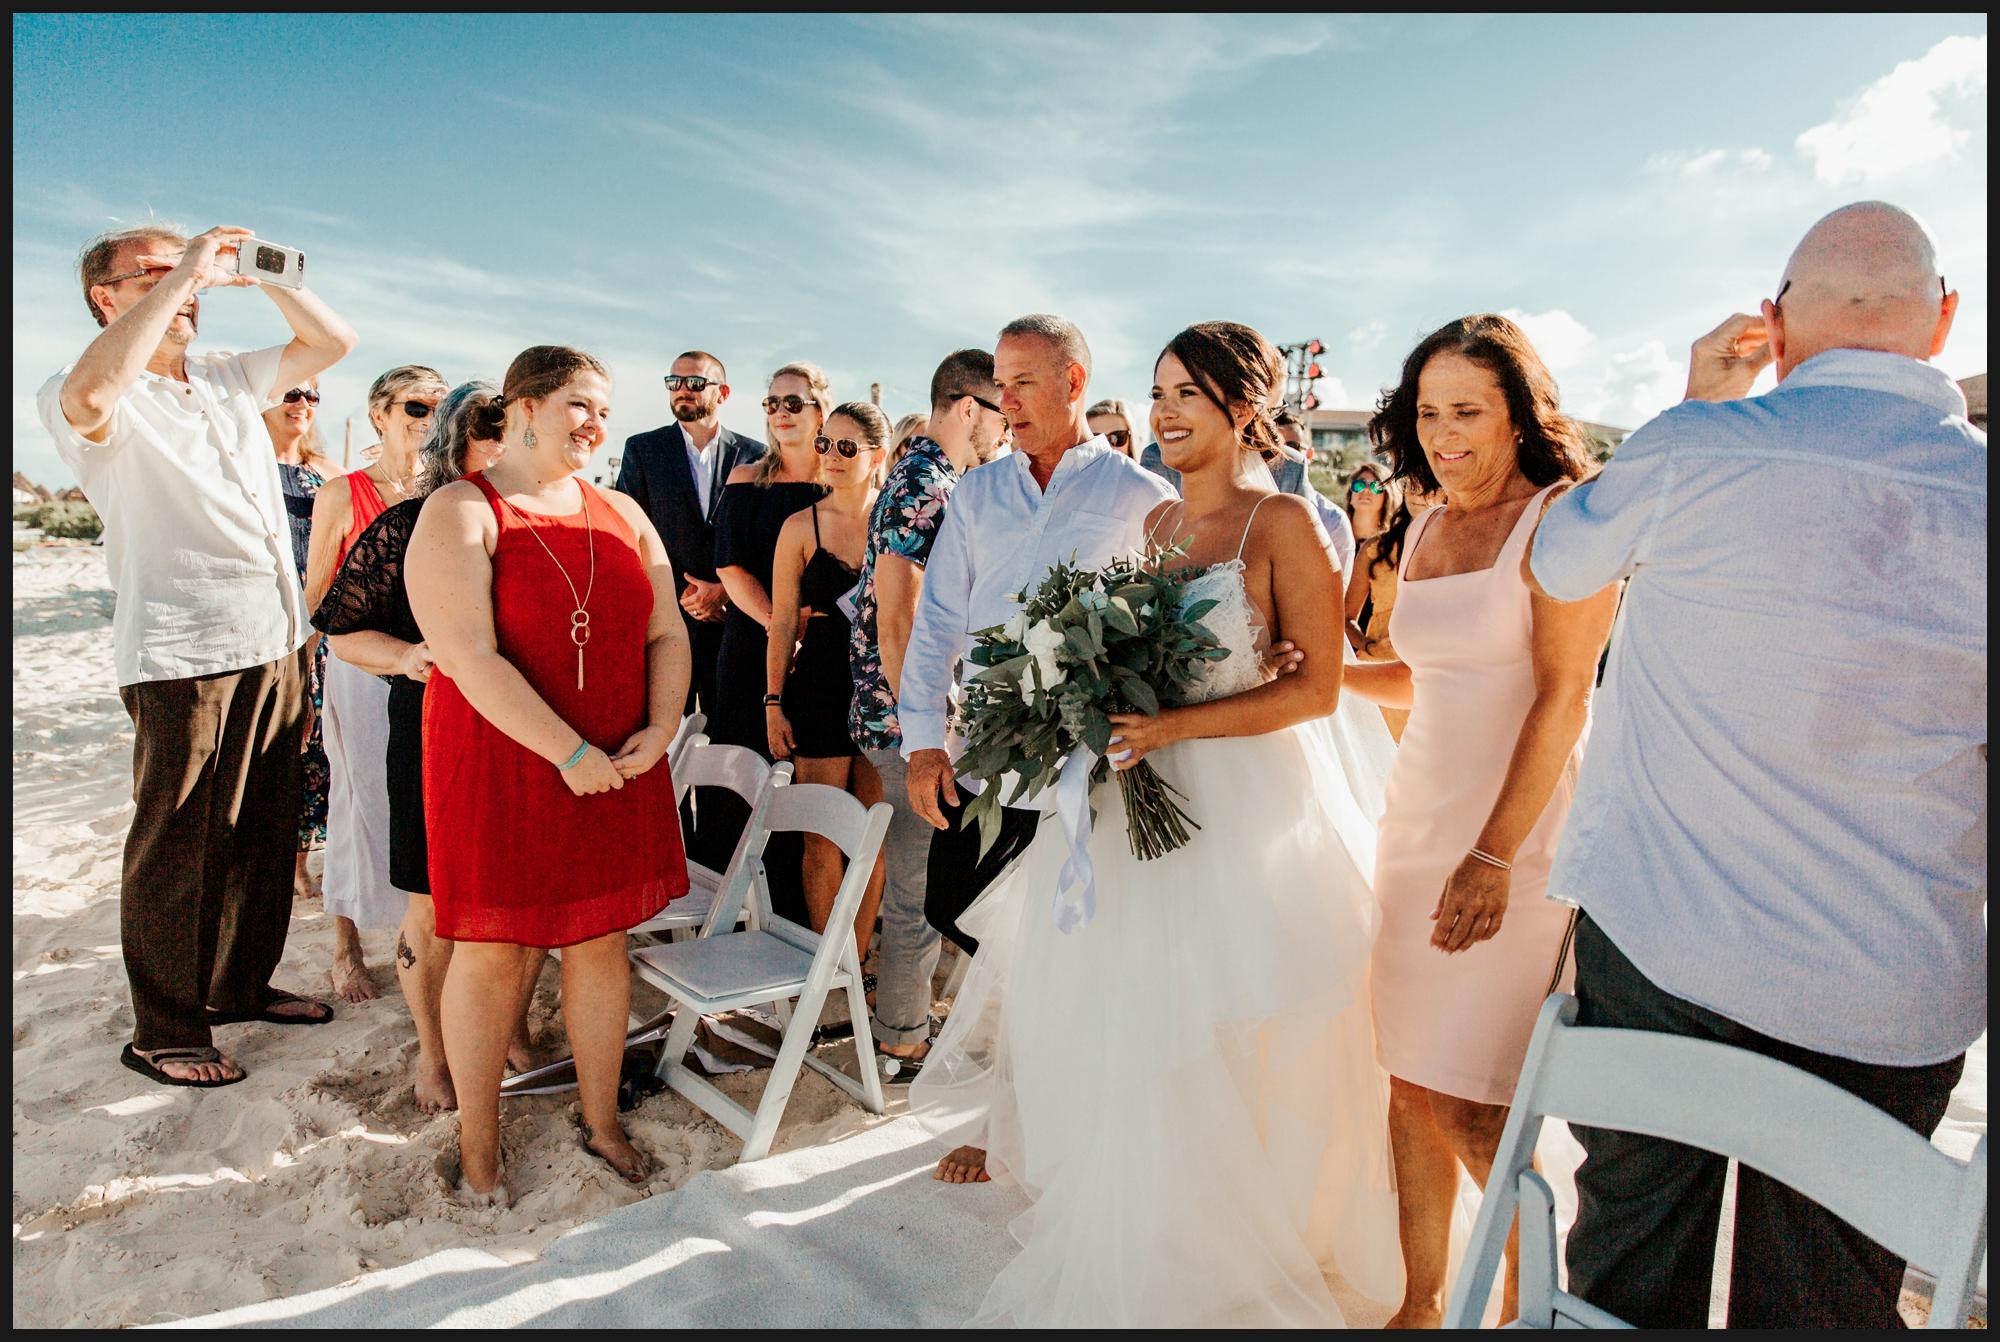 Orlando-Wedding-Photographer-destination-wedding-photographer-florida-wedding-photographer-bohemian-wedding-photographer_0501.jpg